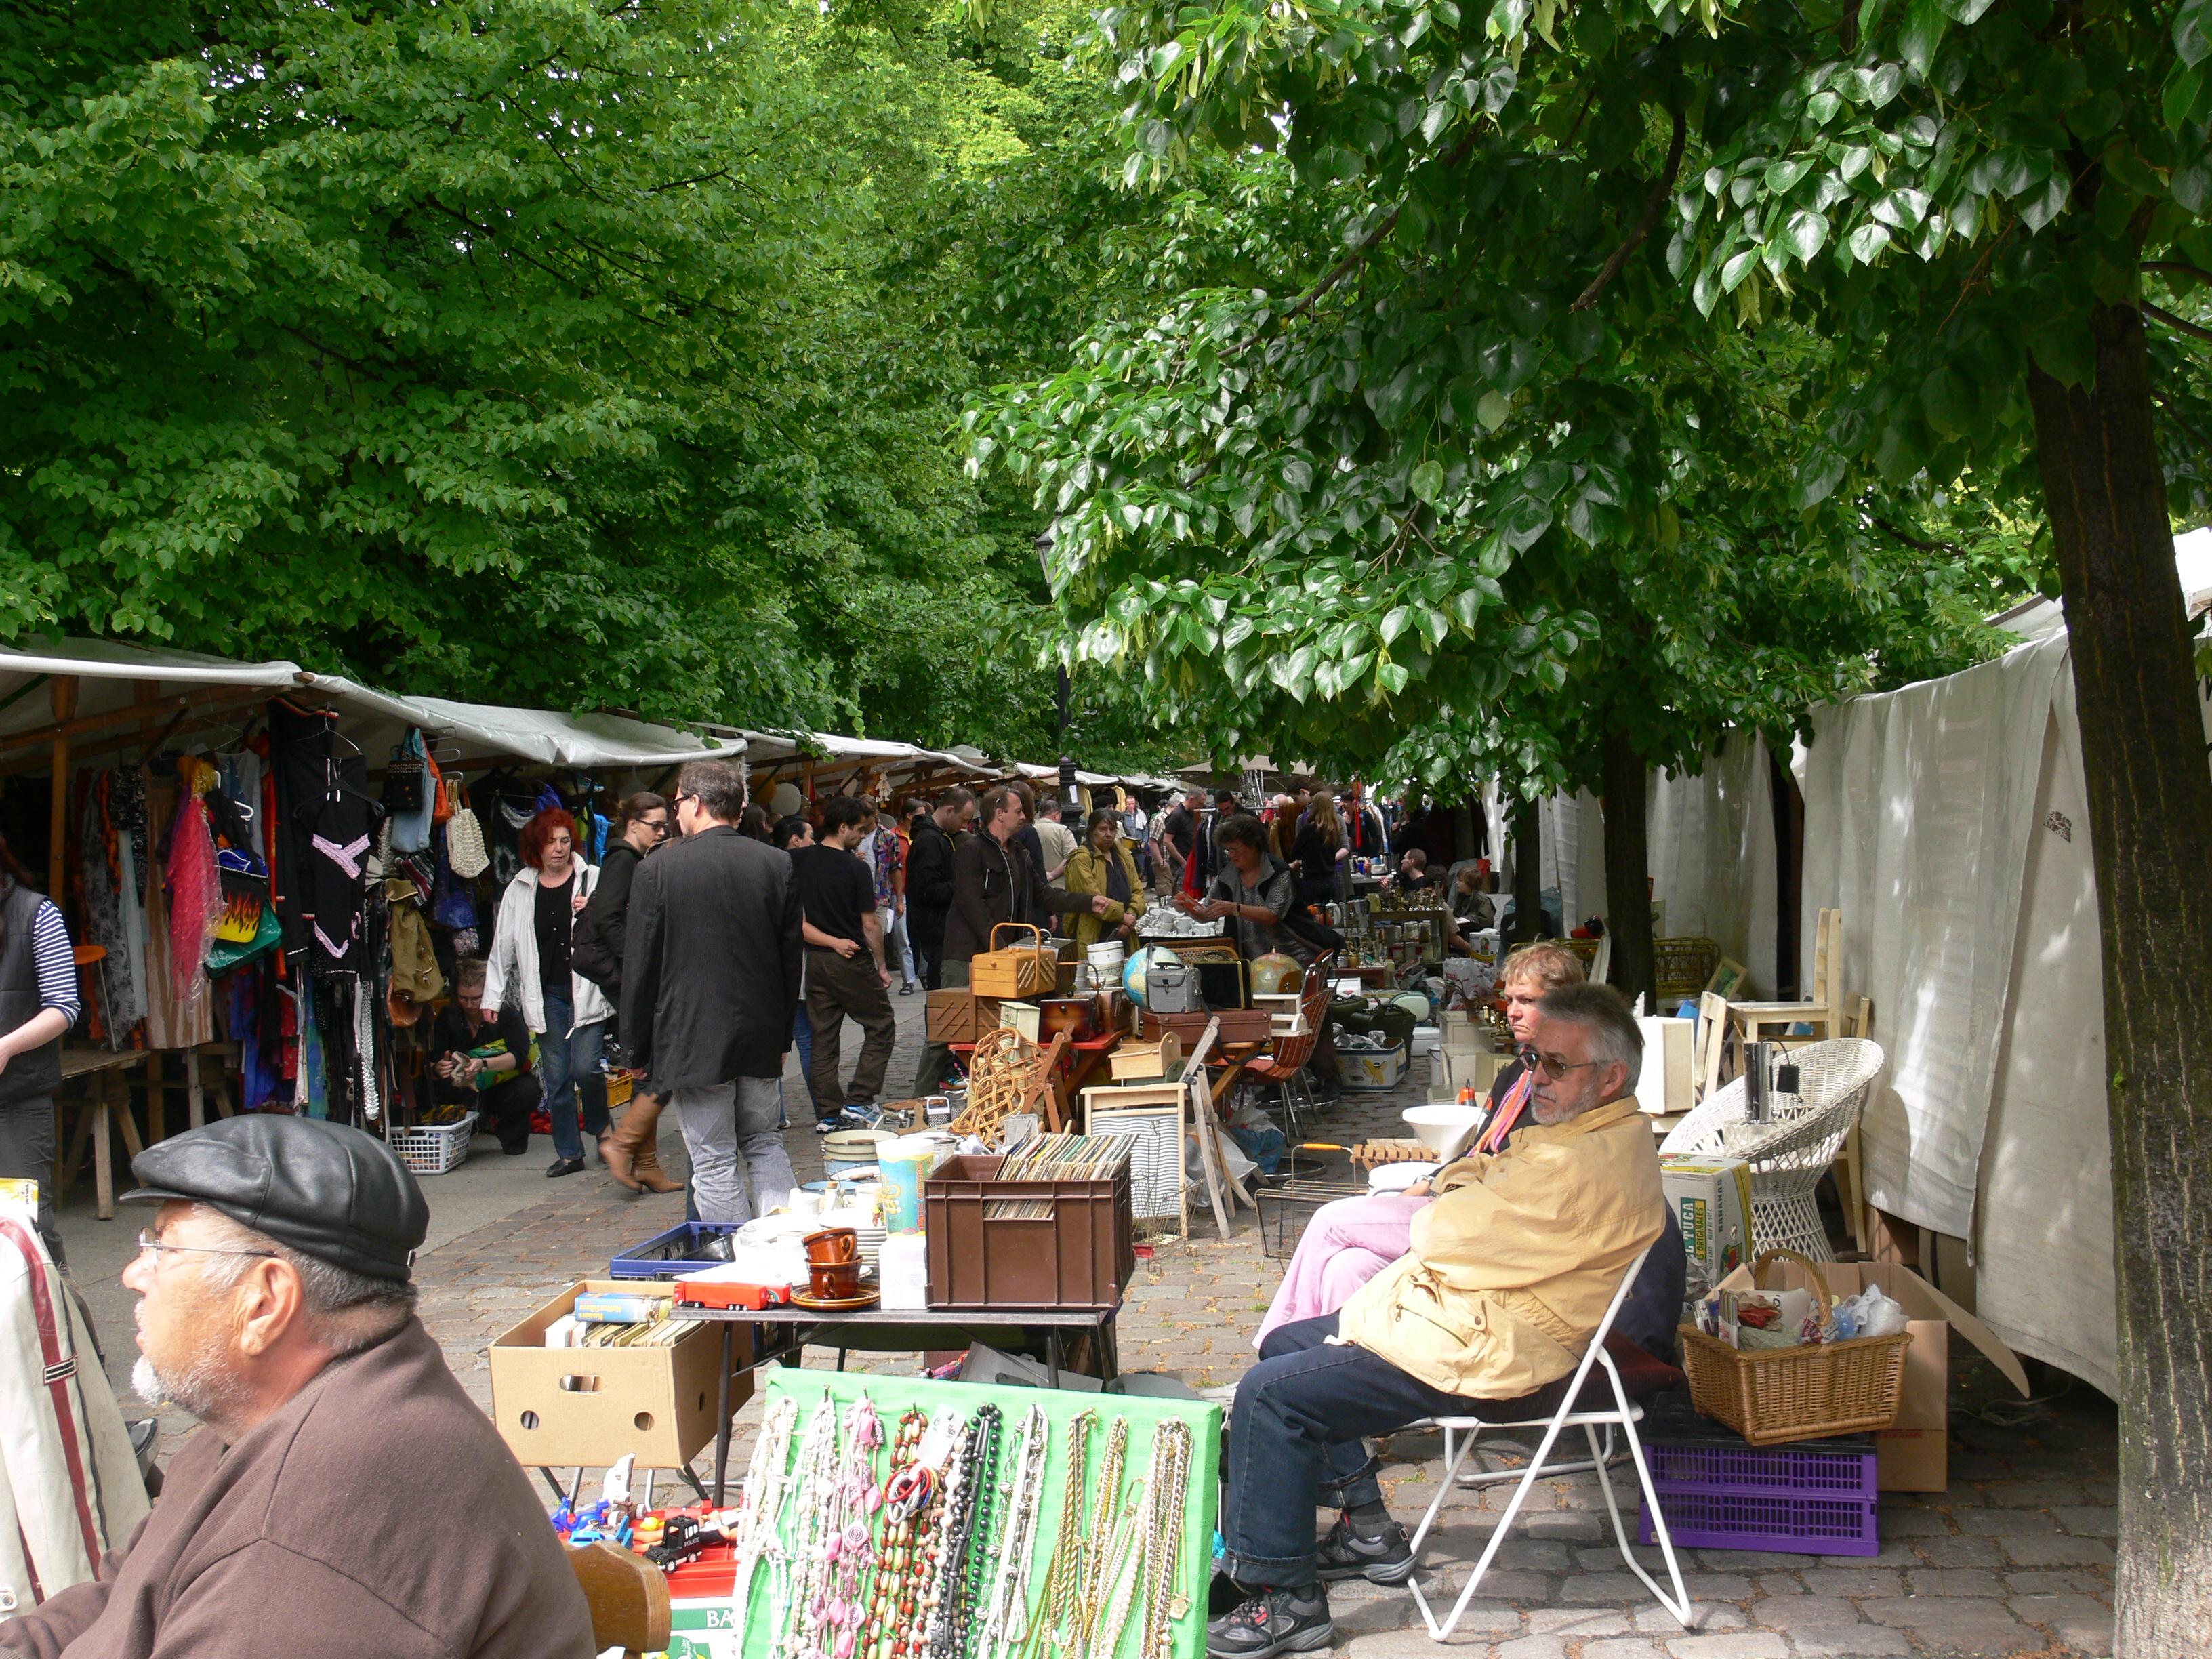 Flohmarkt berlin 4 3